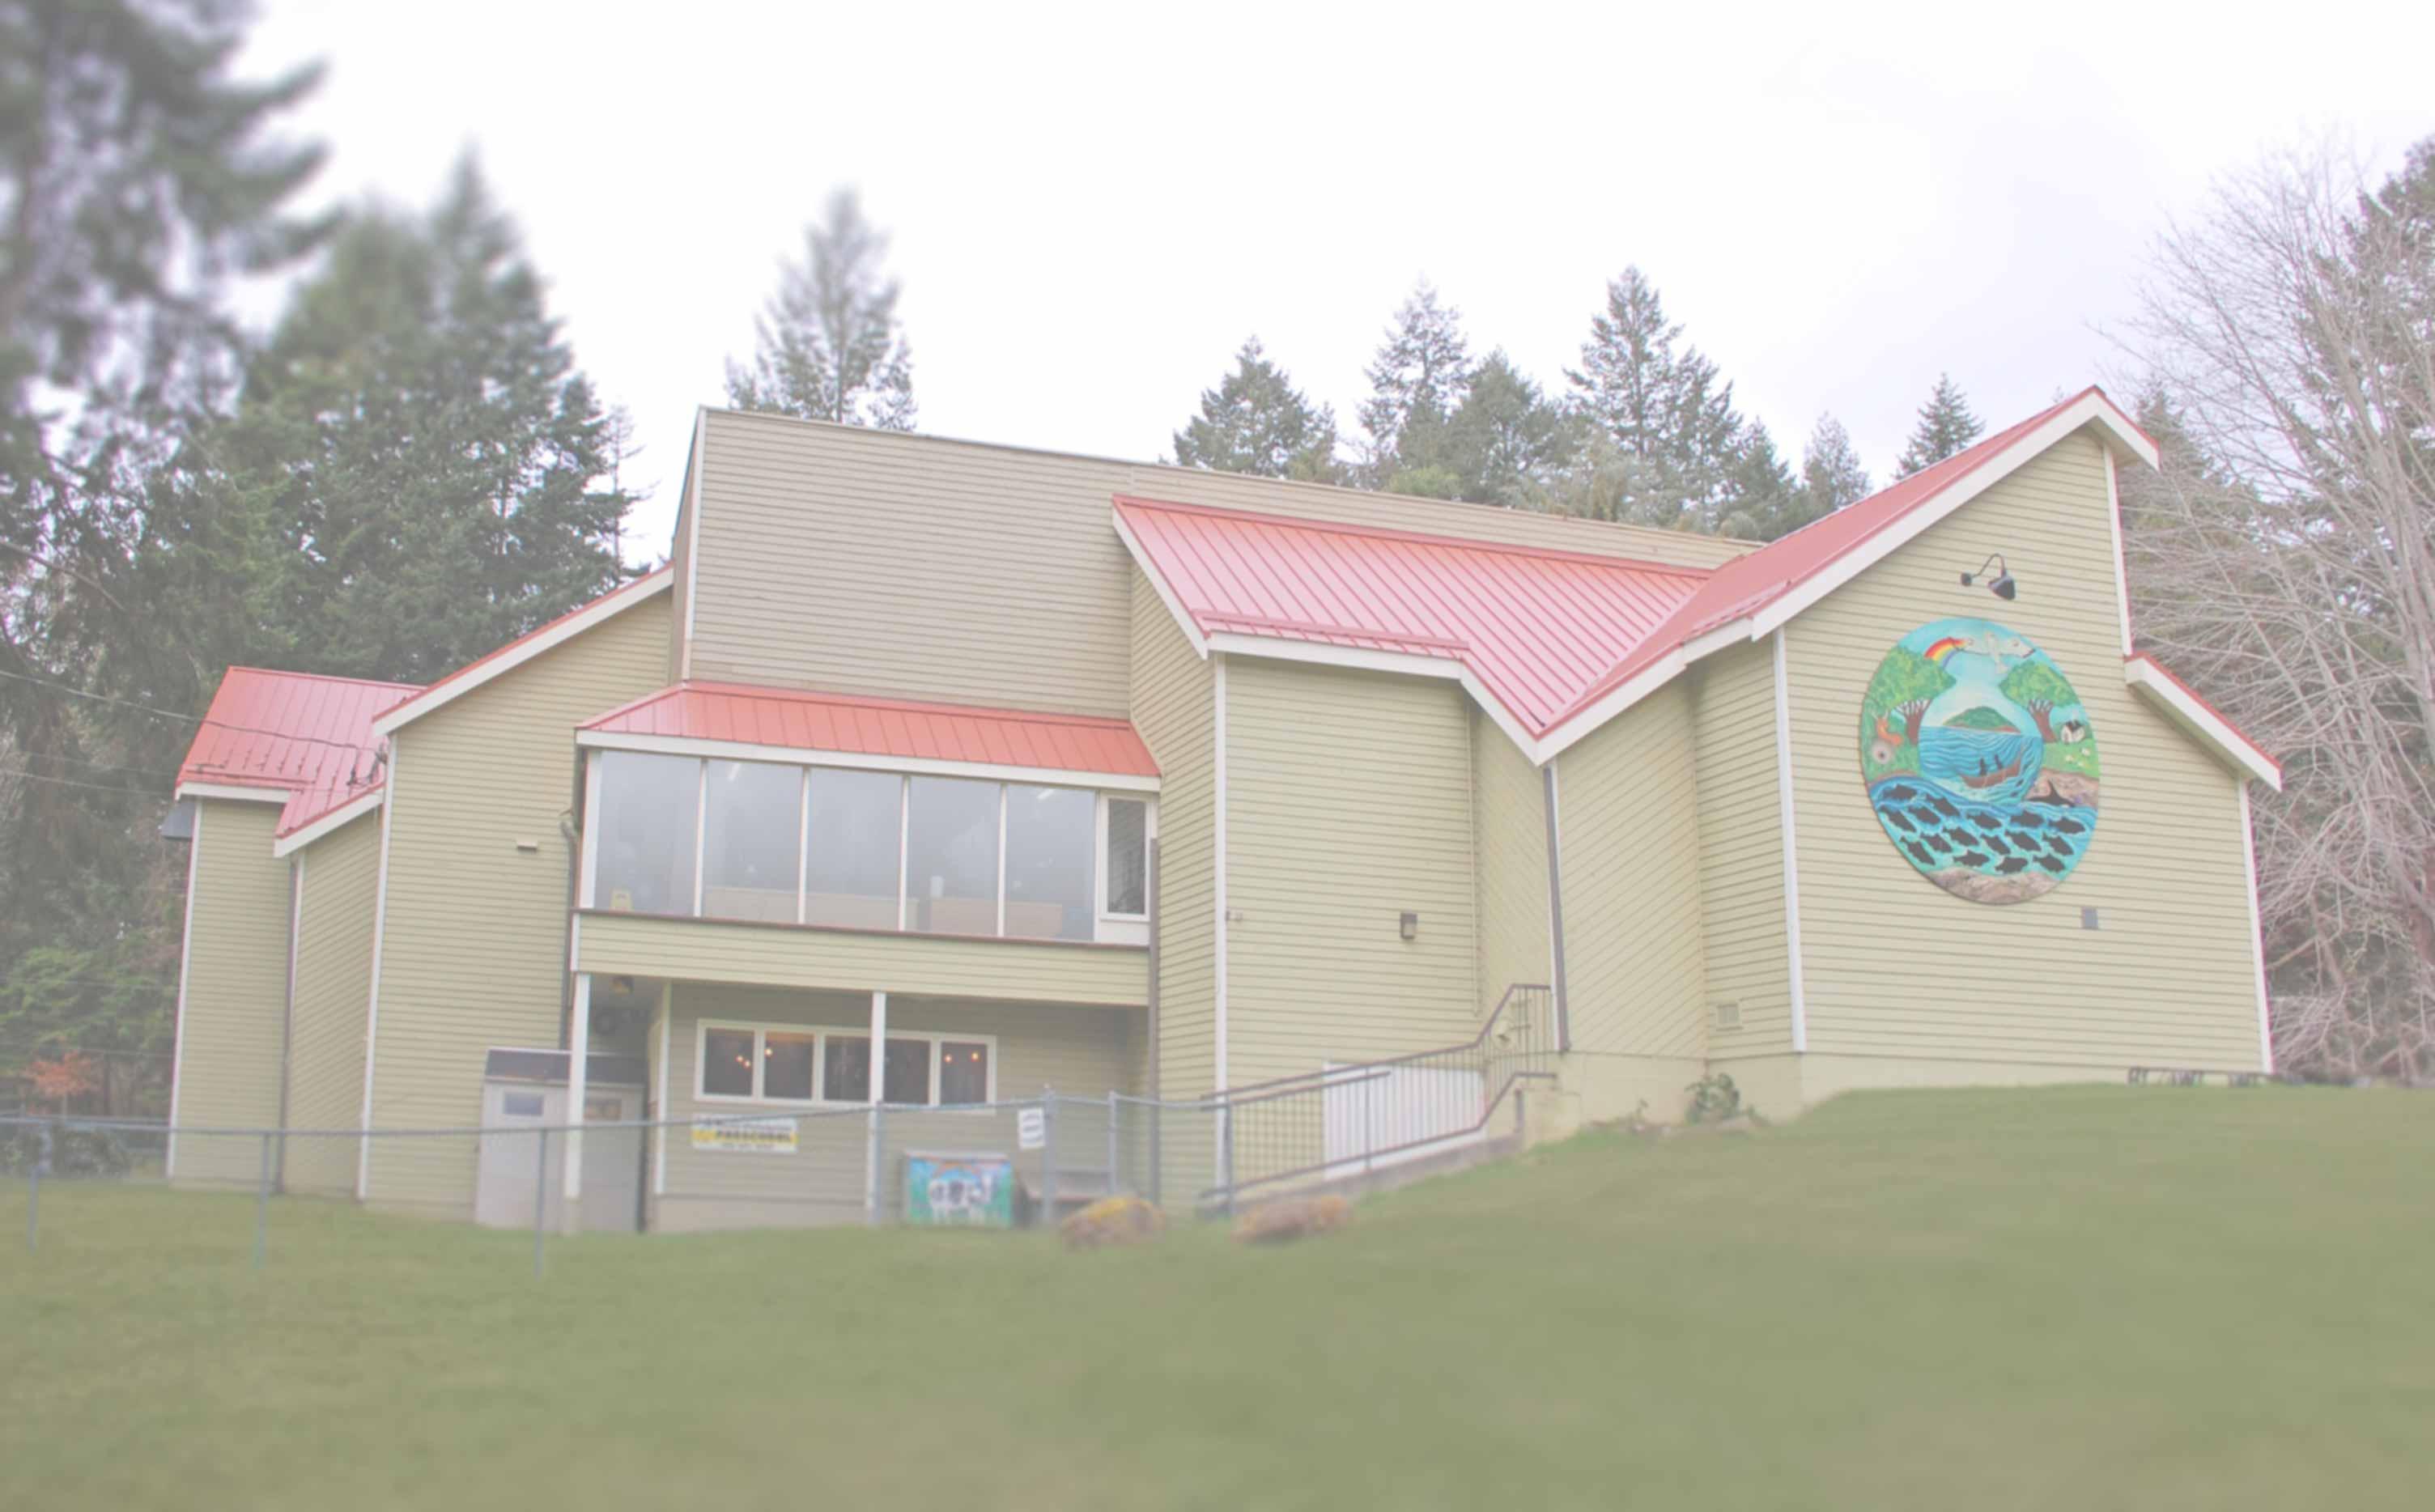 Image of the Gabriola Island Community Hall